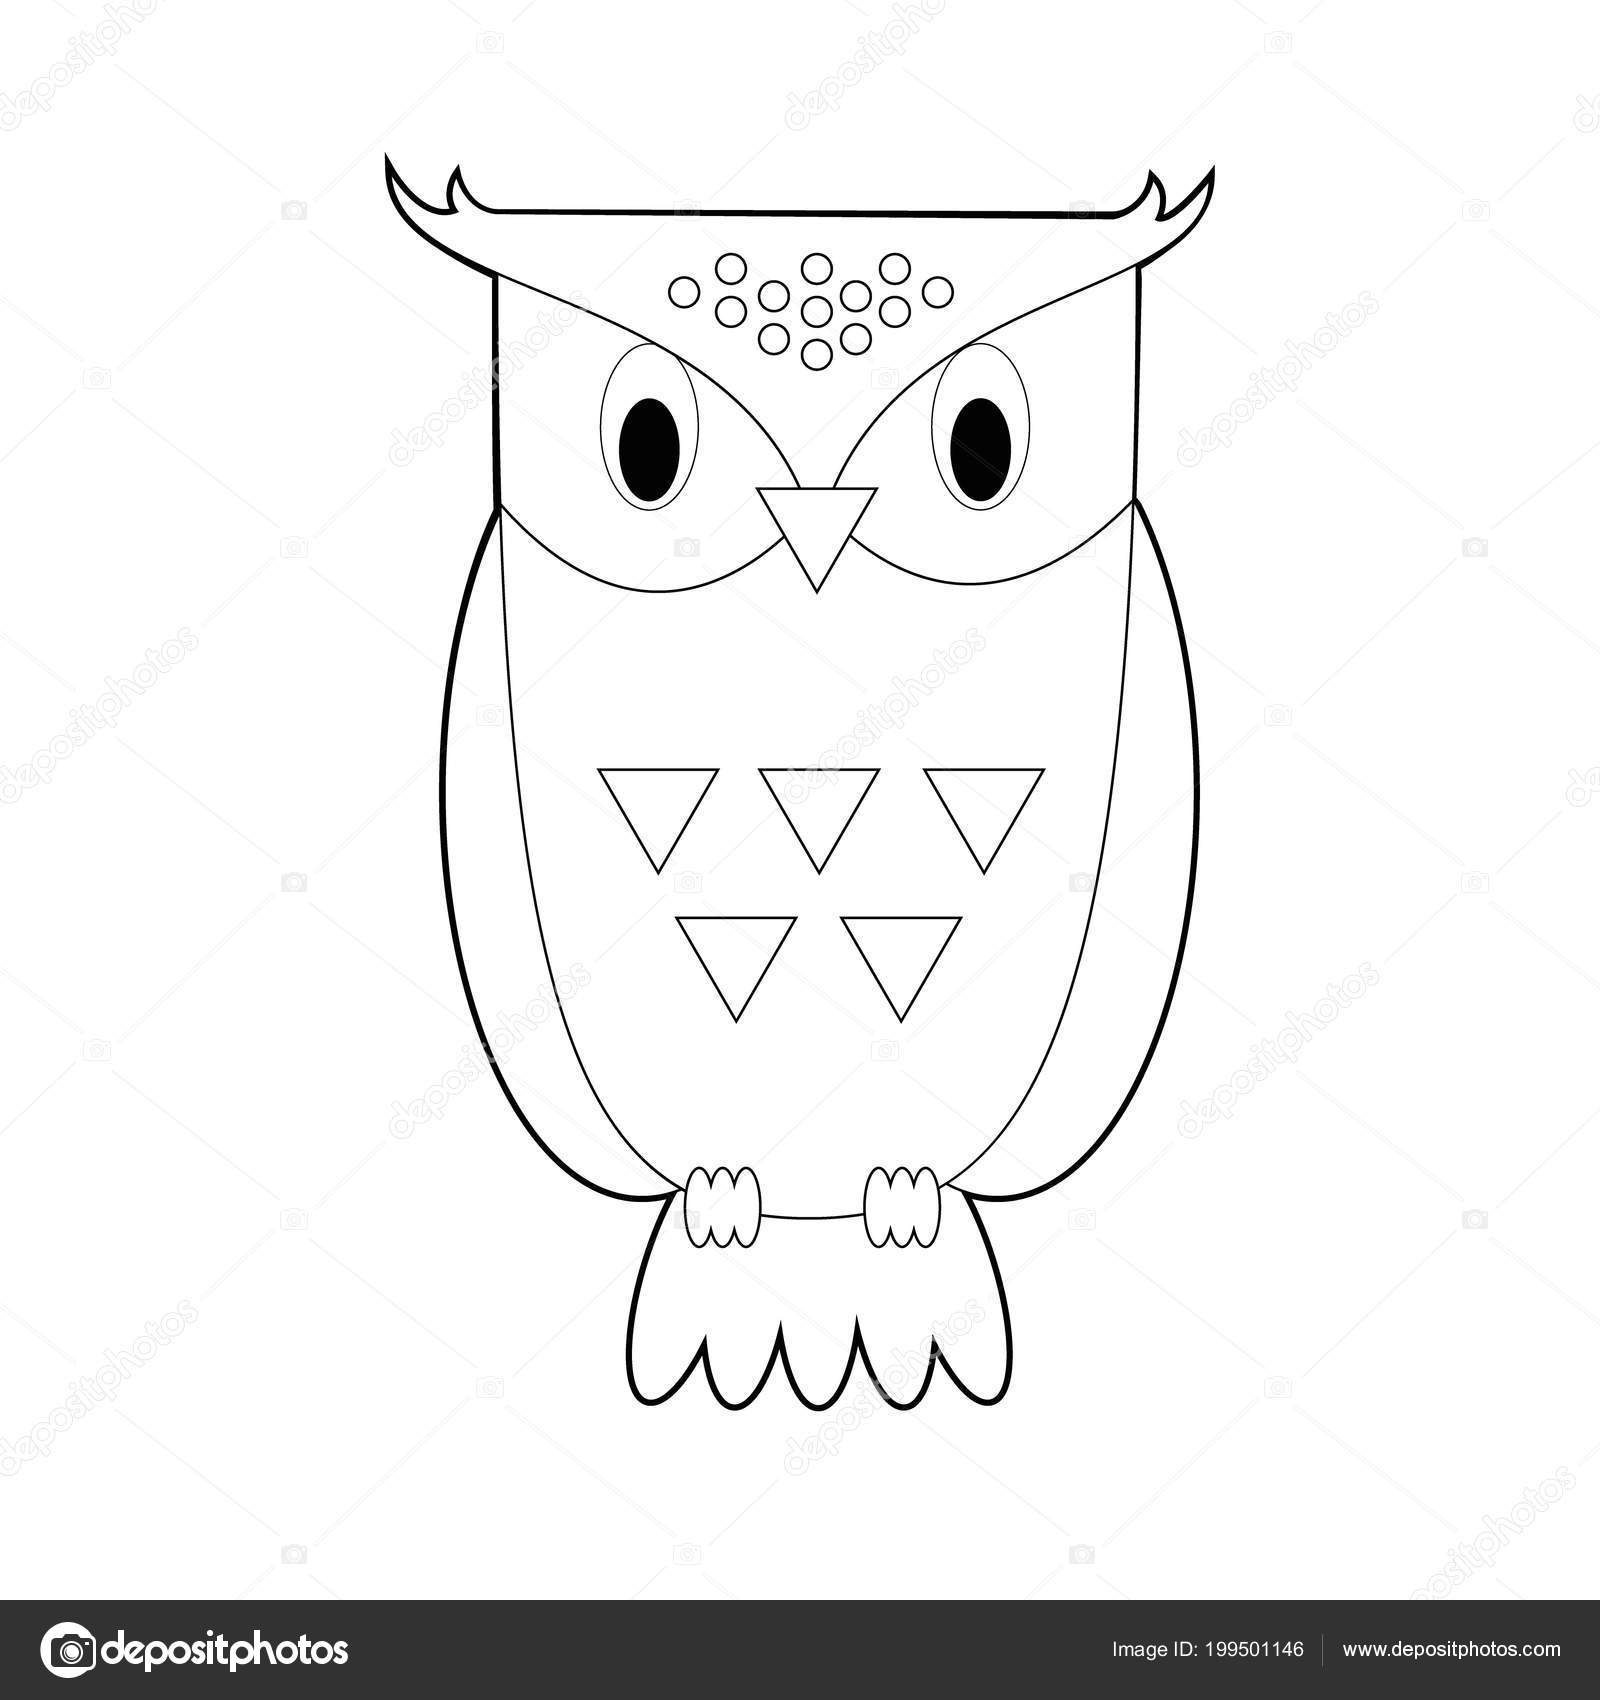 Dibujos Faciles De Sabiduria Fácil Para Colorear Dibujos Animales